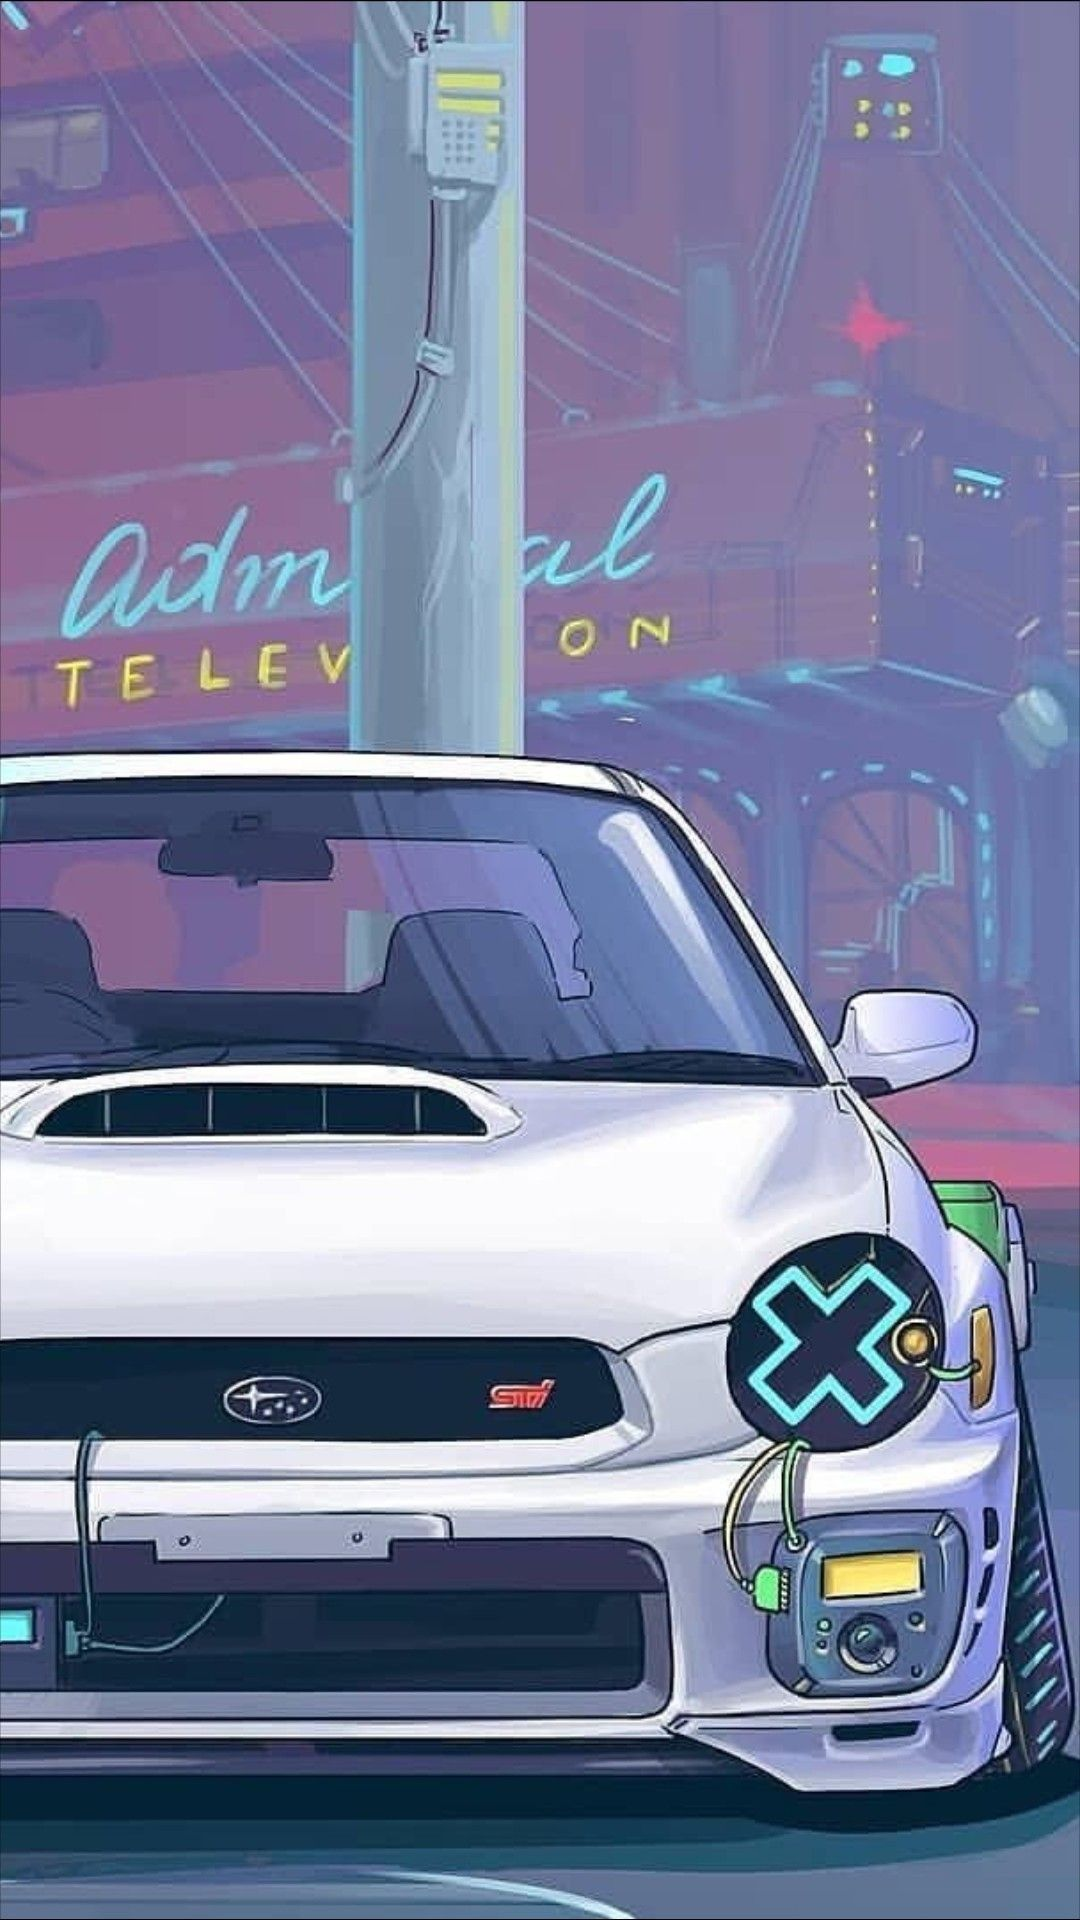 Pin by 𝕔𝕒𝕣𝕪𝕤𝕤𝕒🦋 on Drift cars | Car iphone wallpaper, Jdm ...